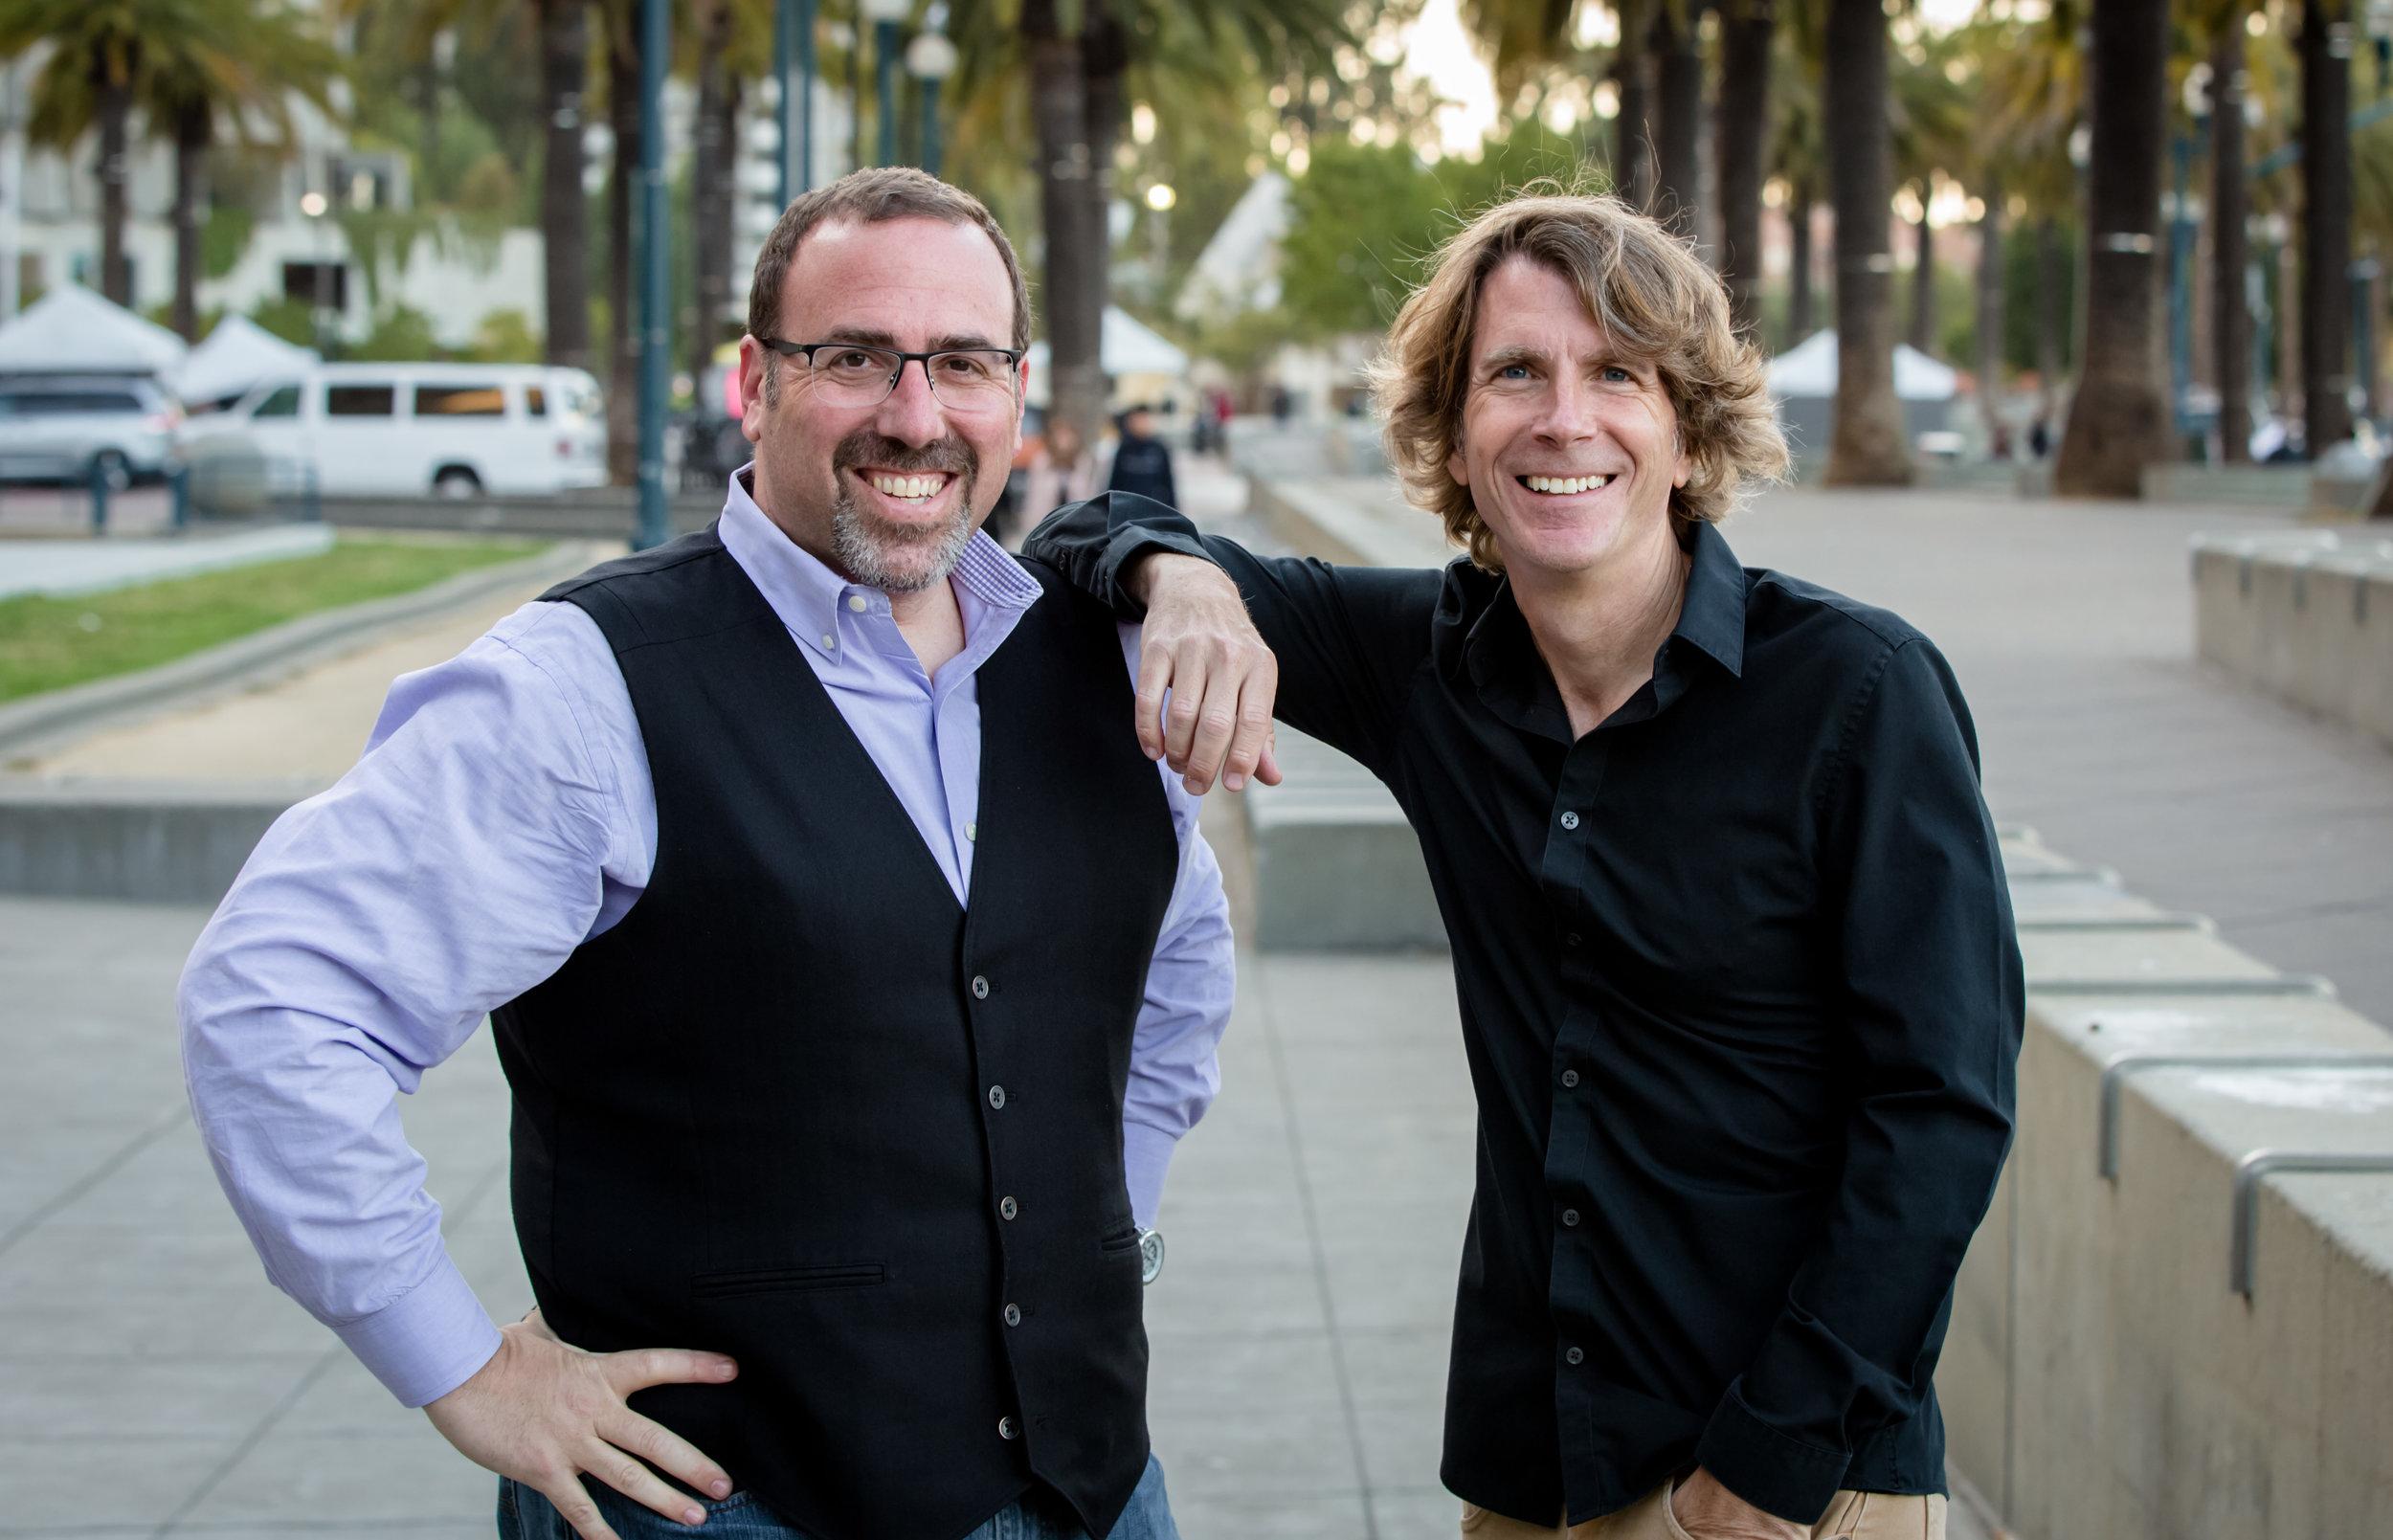 BP Miller and Scott Strazzante